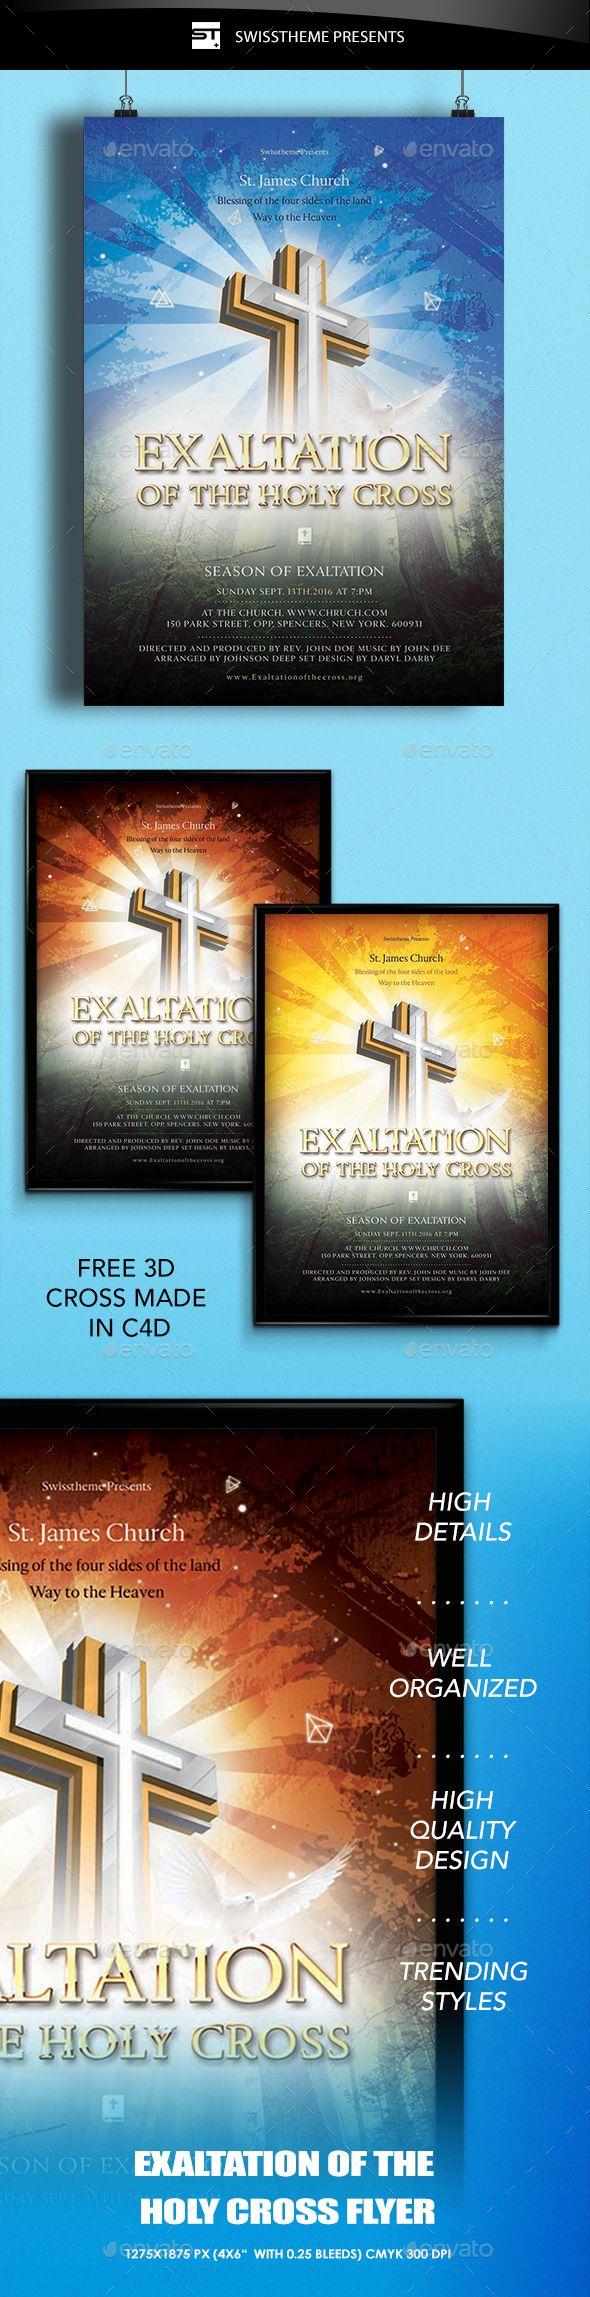 Exaltation of the Holy Cross Flyer